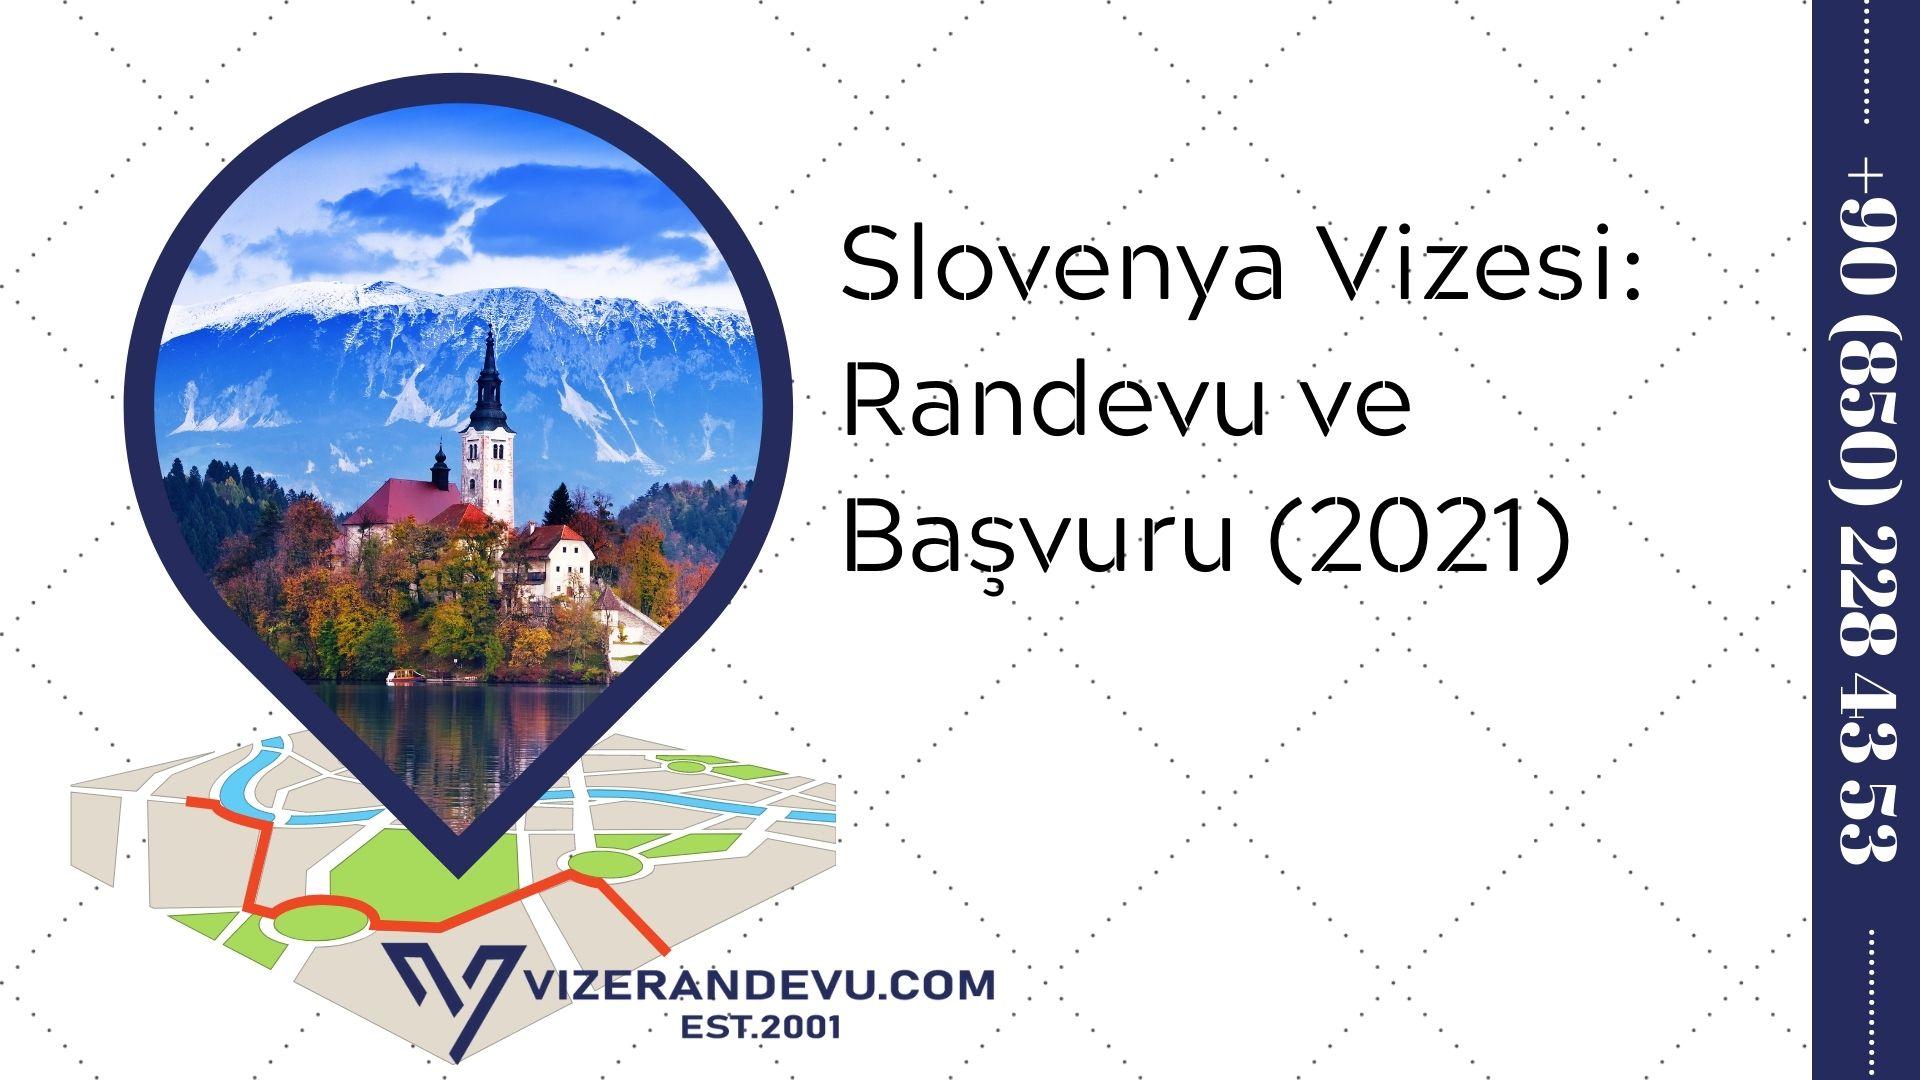 Slovenya Vizesi: Randevu ve Başvuru (2021)